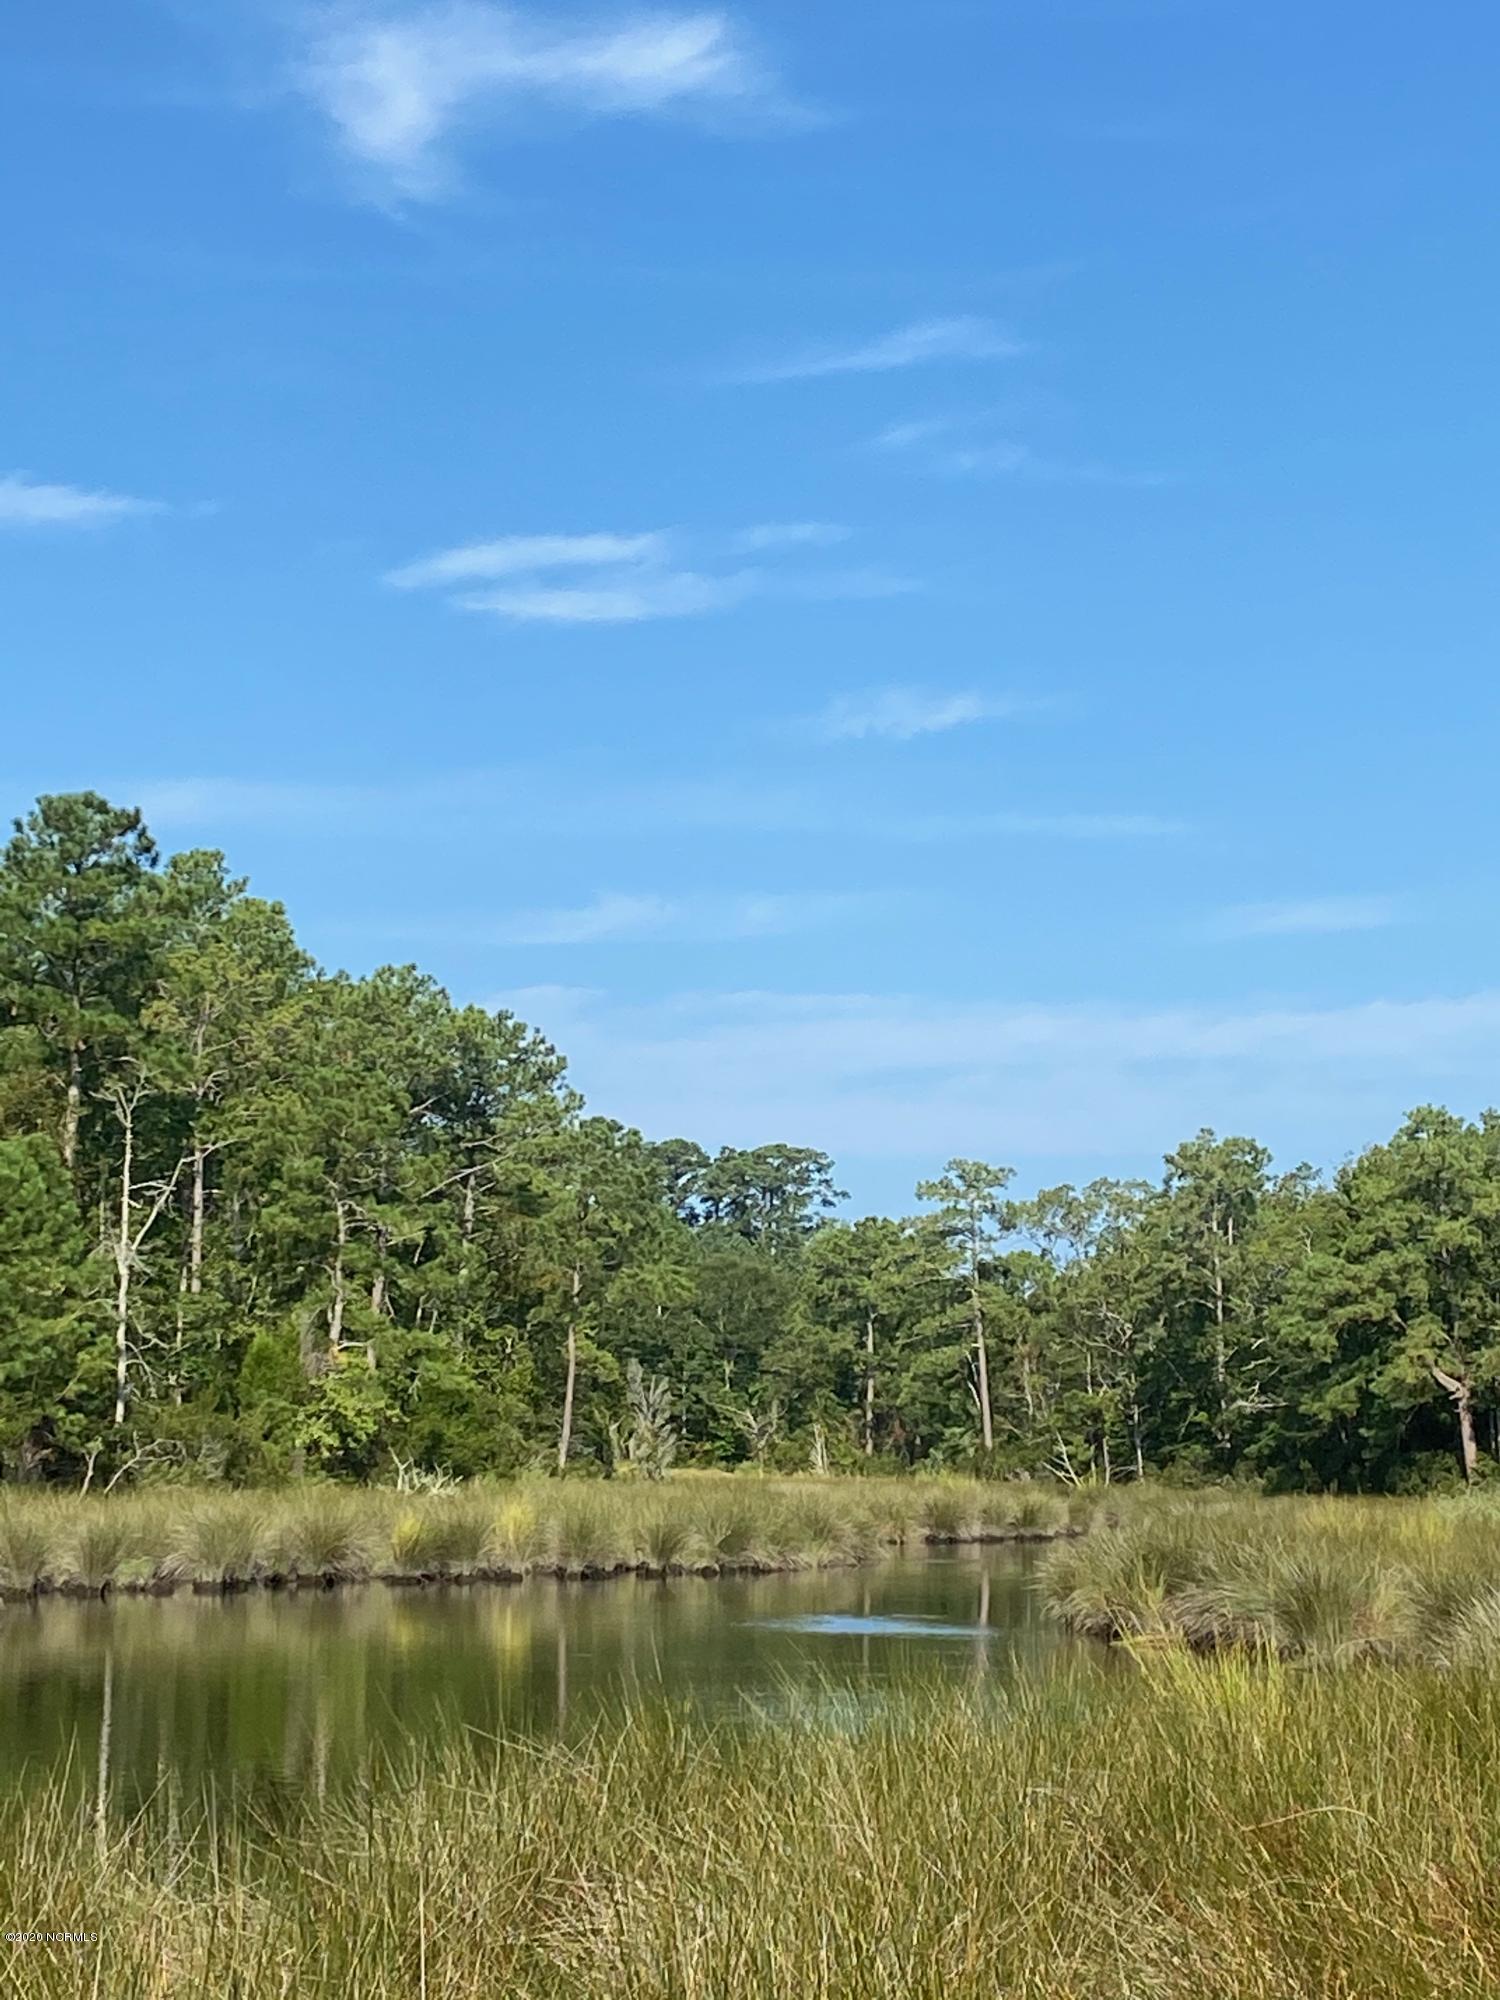 27 Pinecrest Road, Bath, North Carolina 27808, ,Residential land,For sale,Pinecrest,100234550